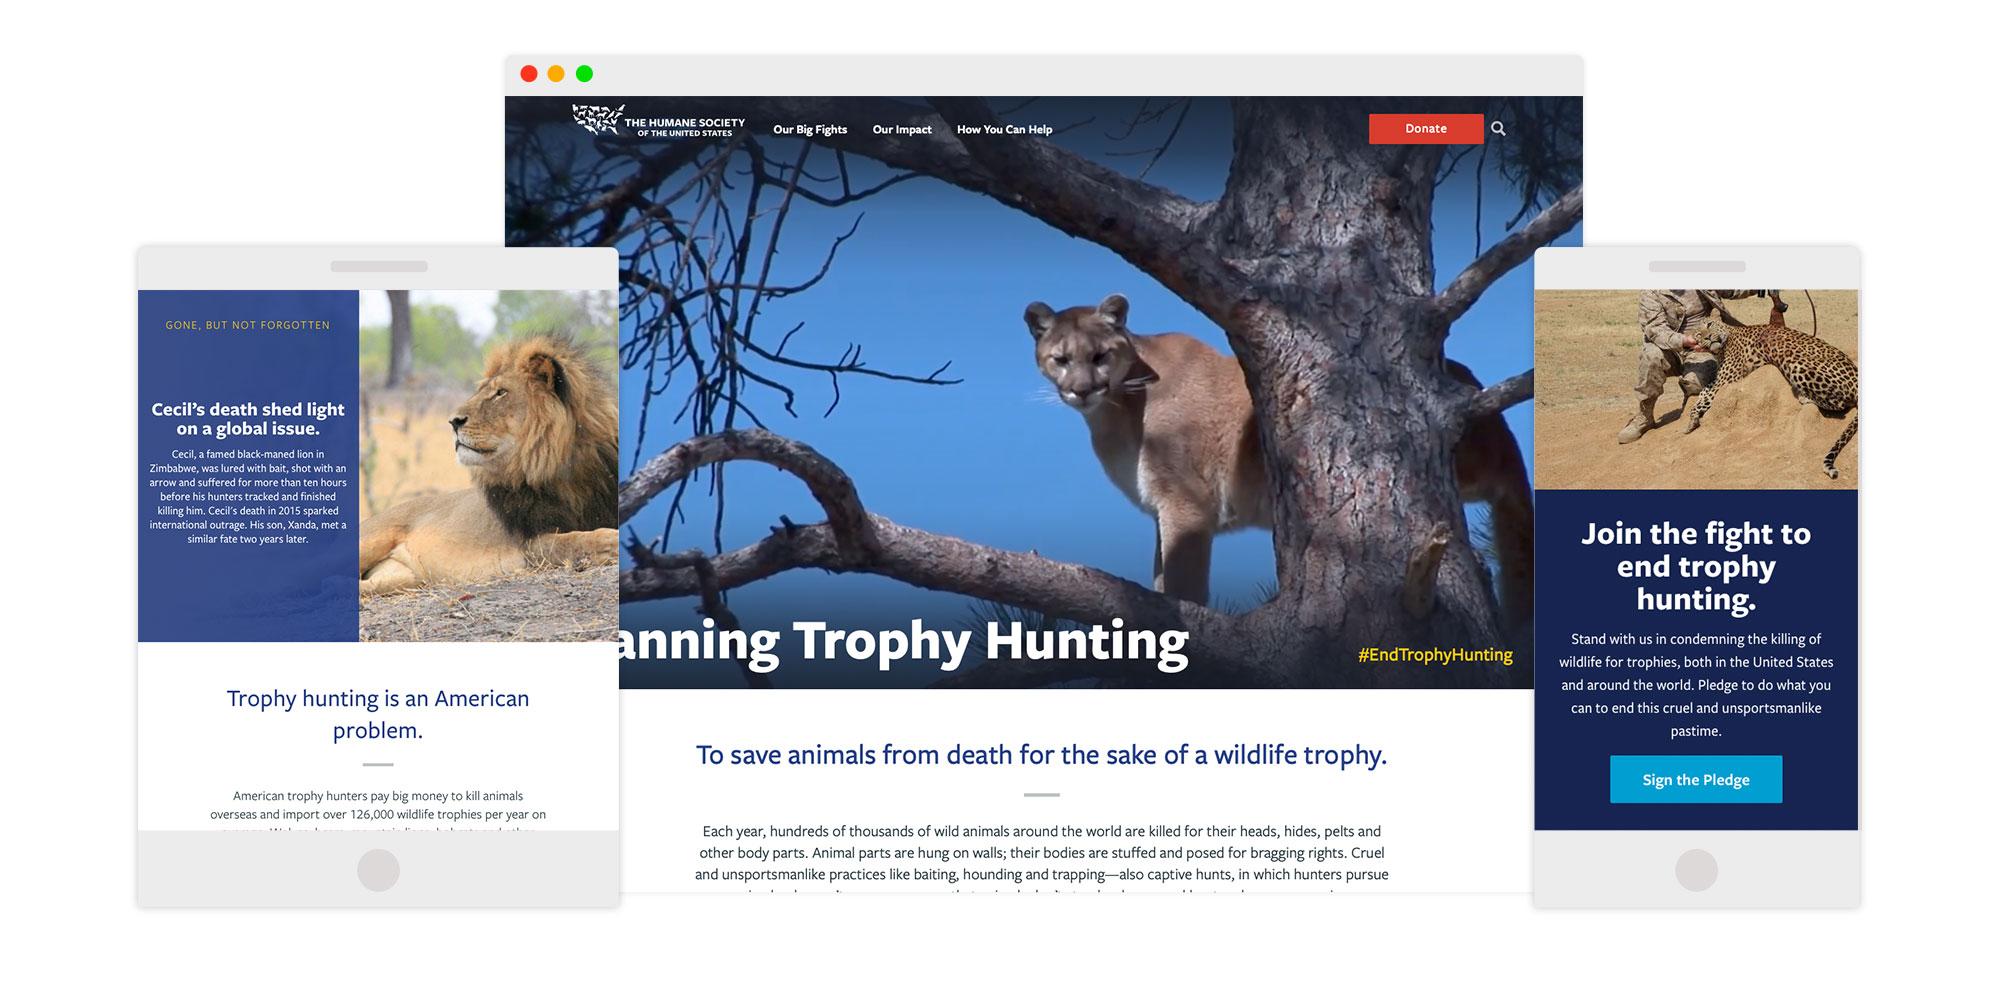 Ban Trophy Hunting